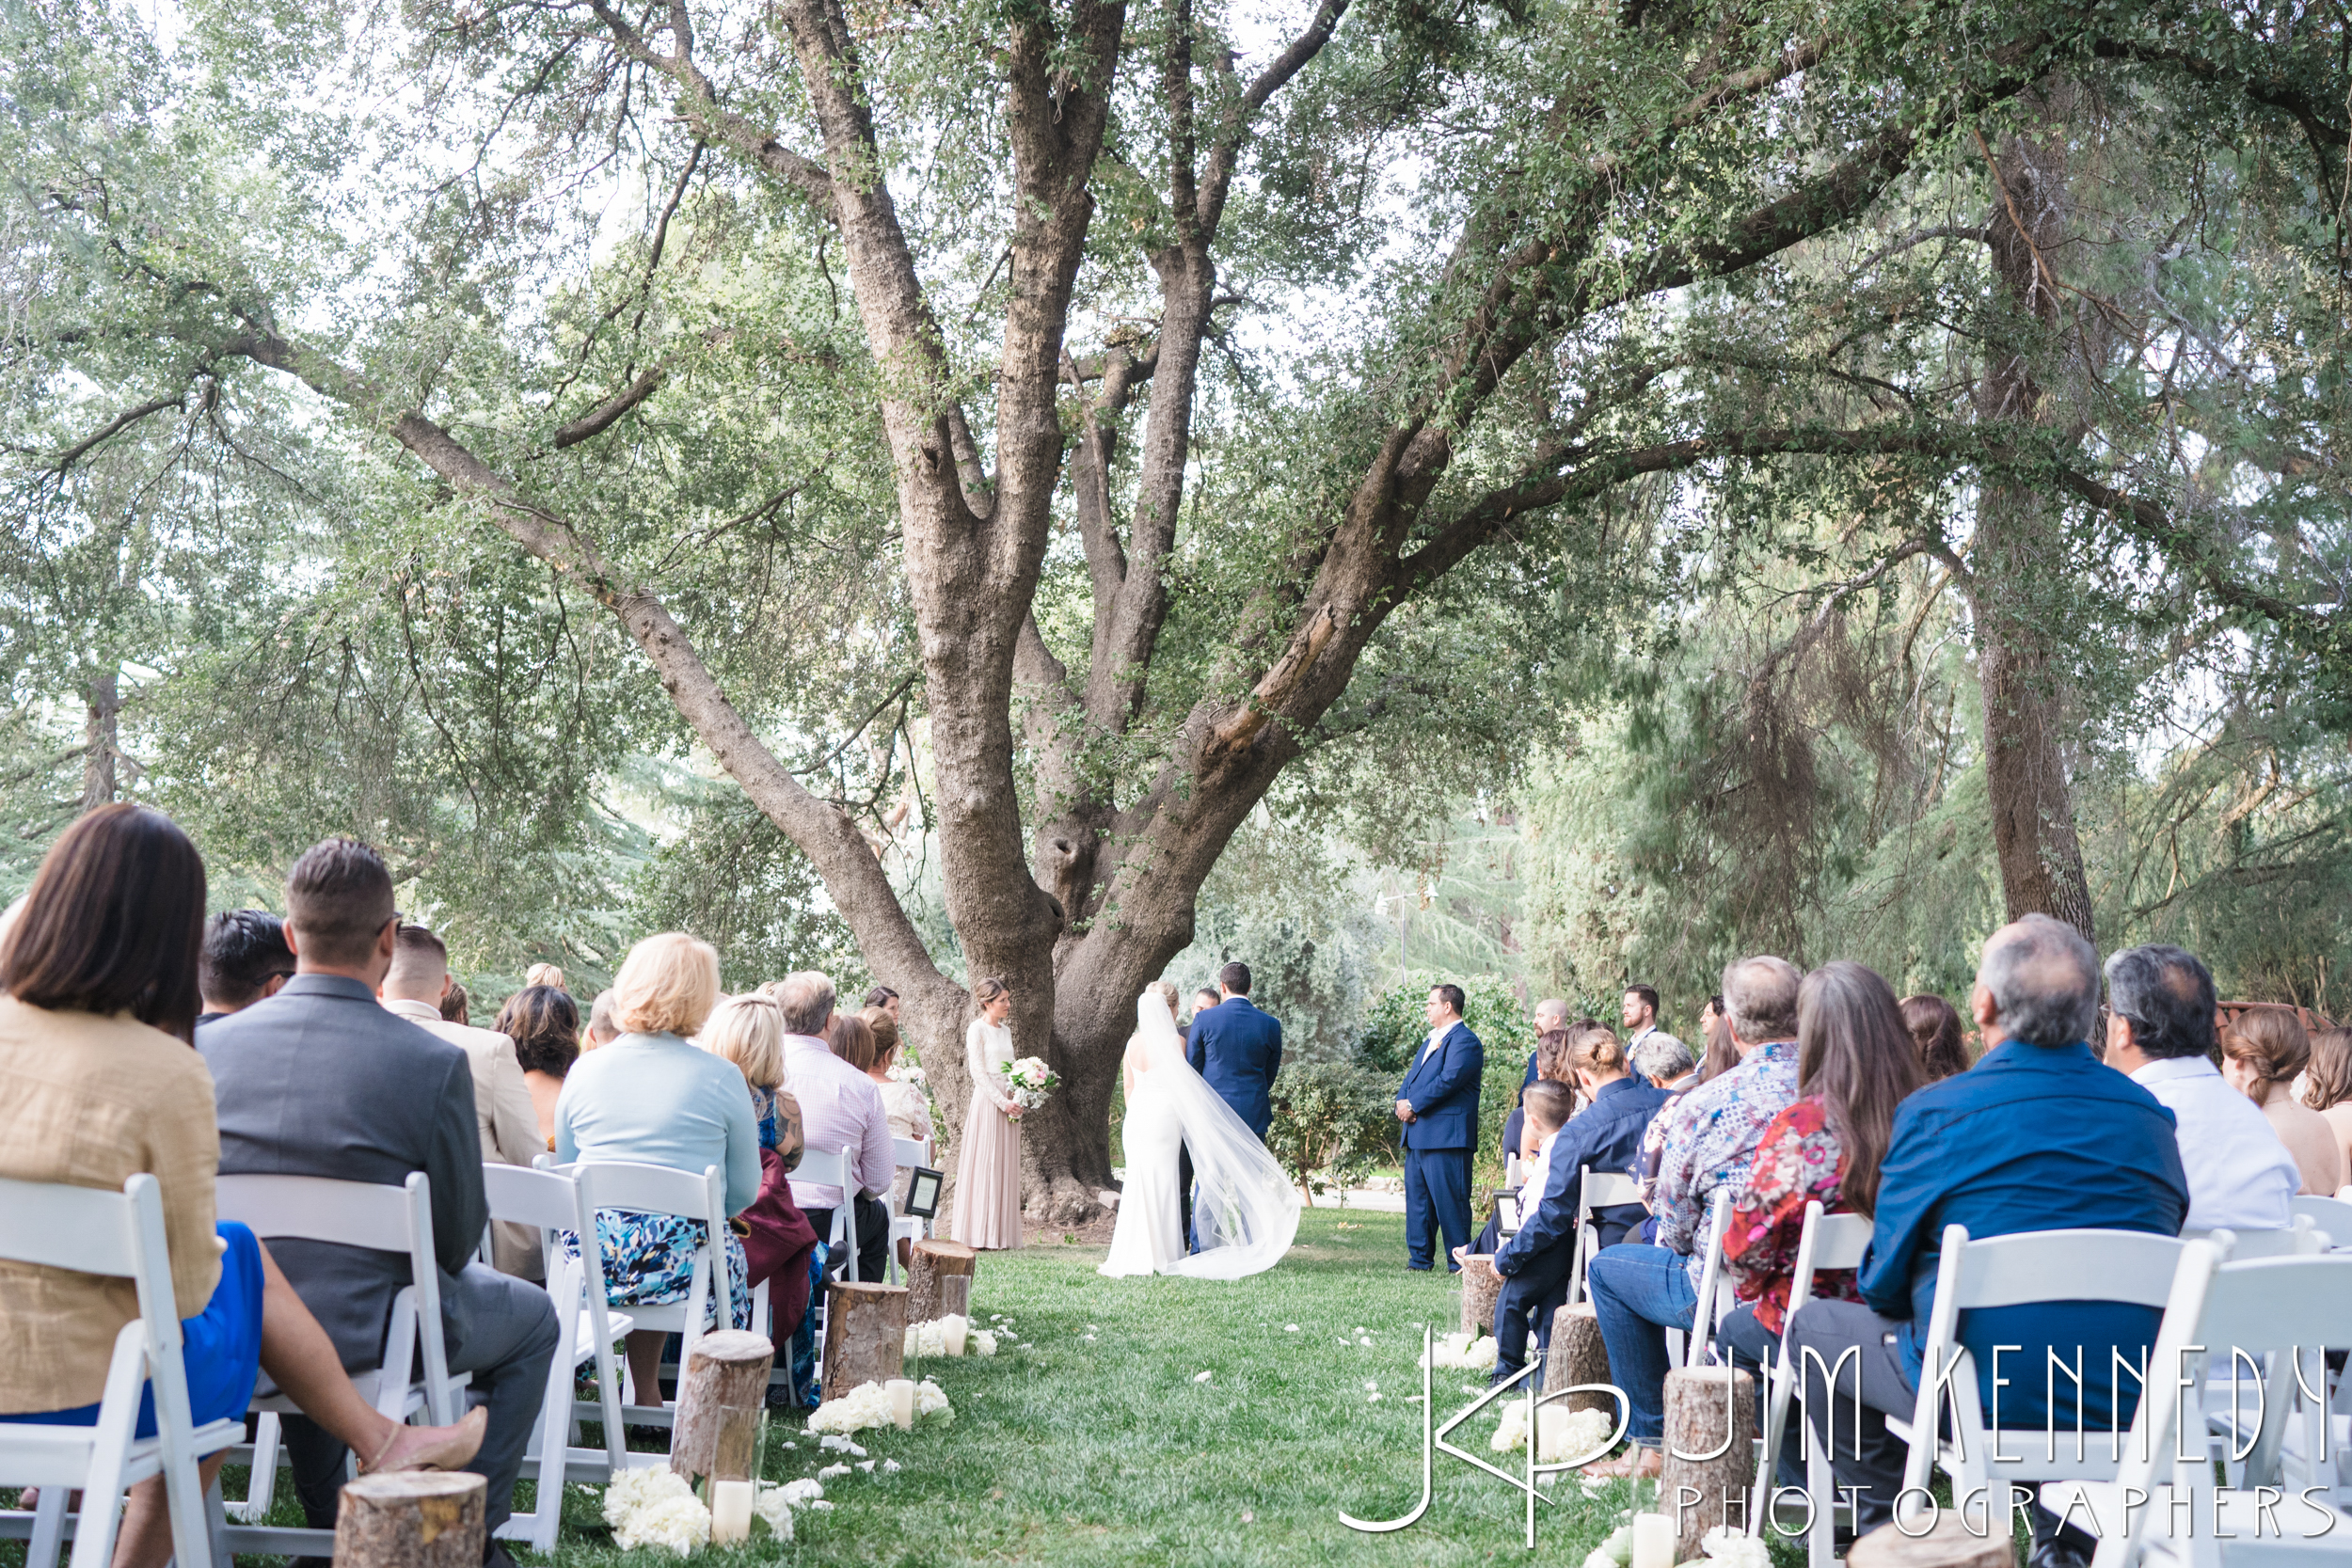 jim_kennedy_photographers_highland_springs_wedding_caitlyn_0112.jpg